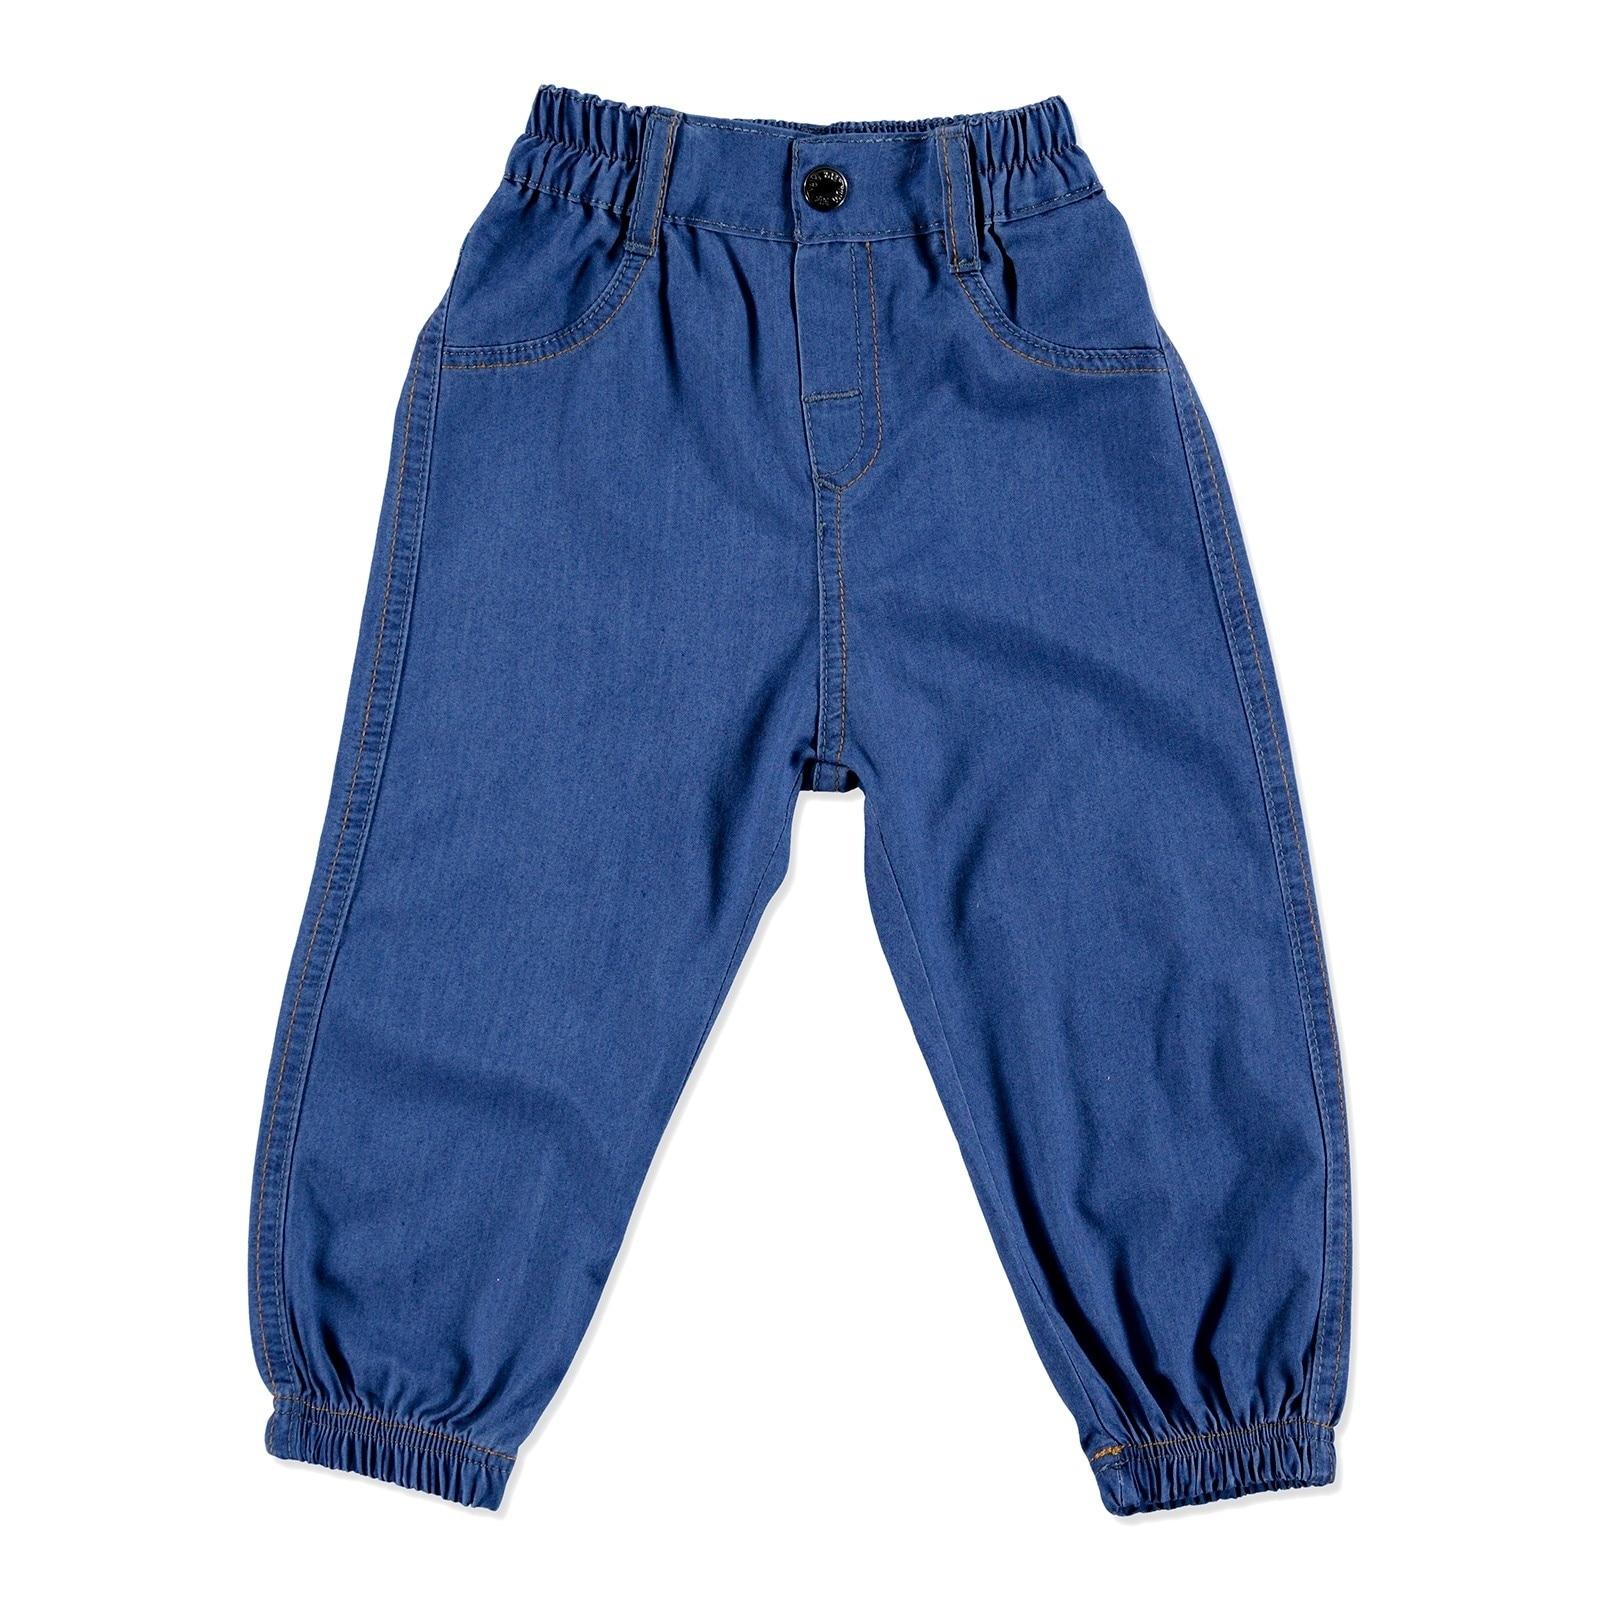 Ebebek HelloBaby Summer Baby Denim Cotton Pant